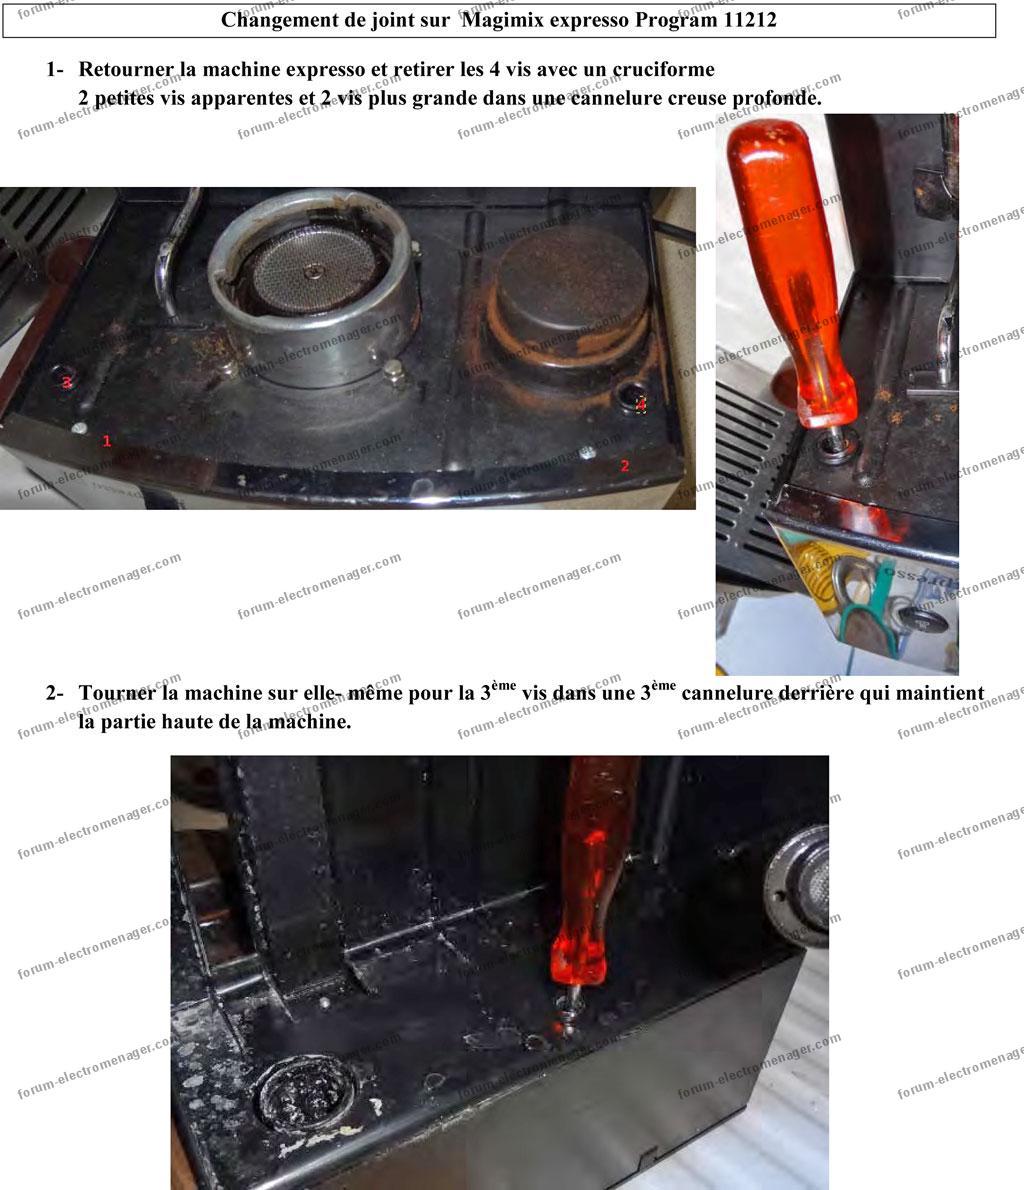 depannage machine a cafe expresso magimix